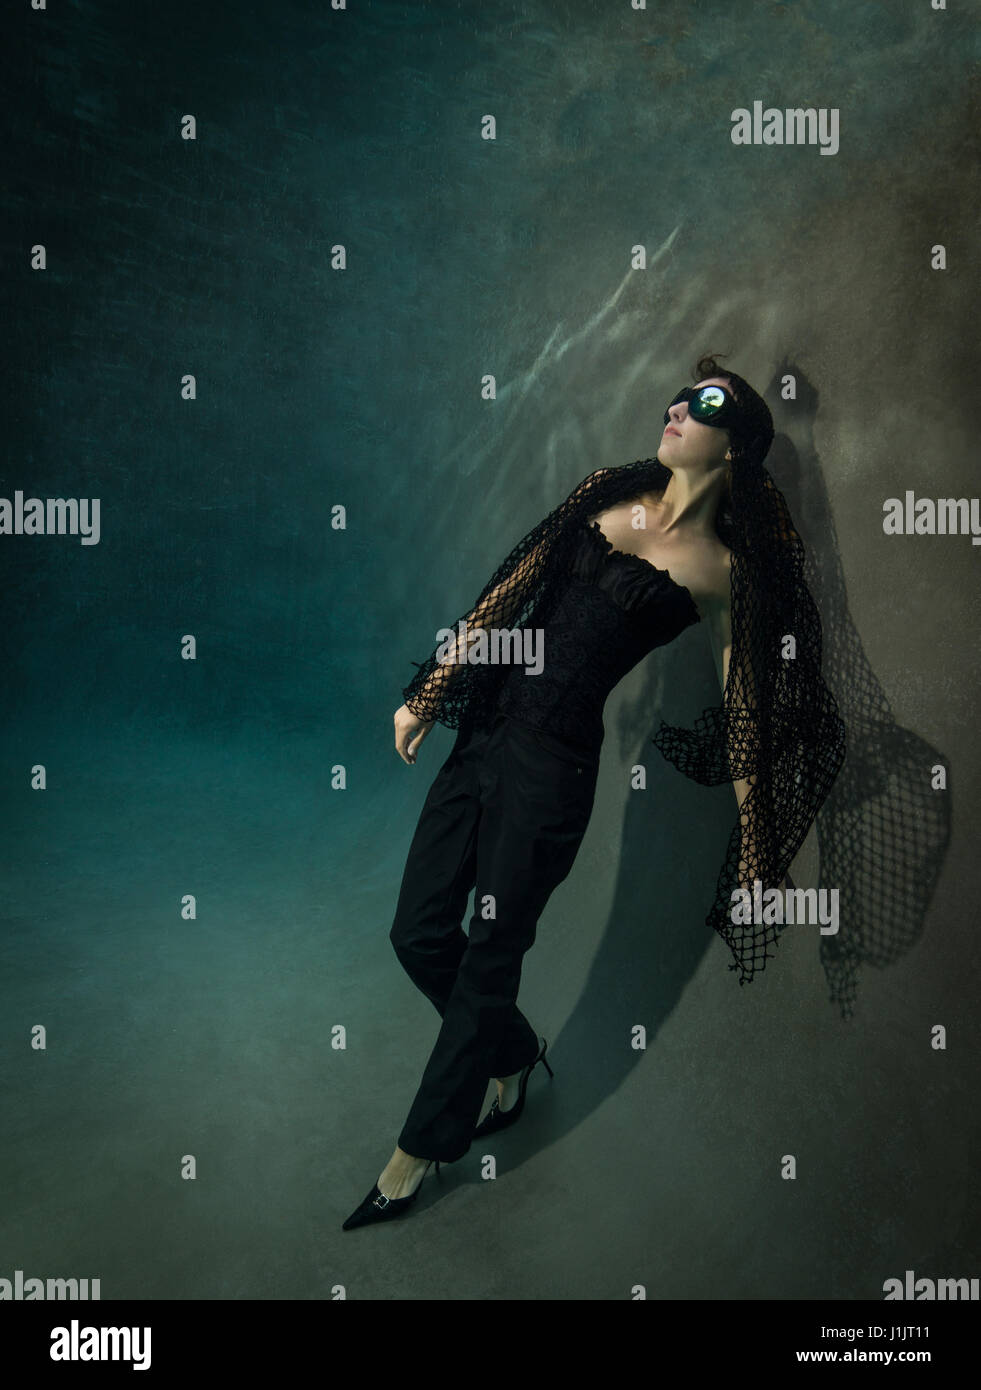 Underwater fashion - Stock Image